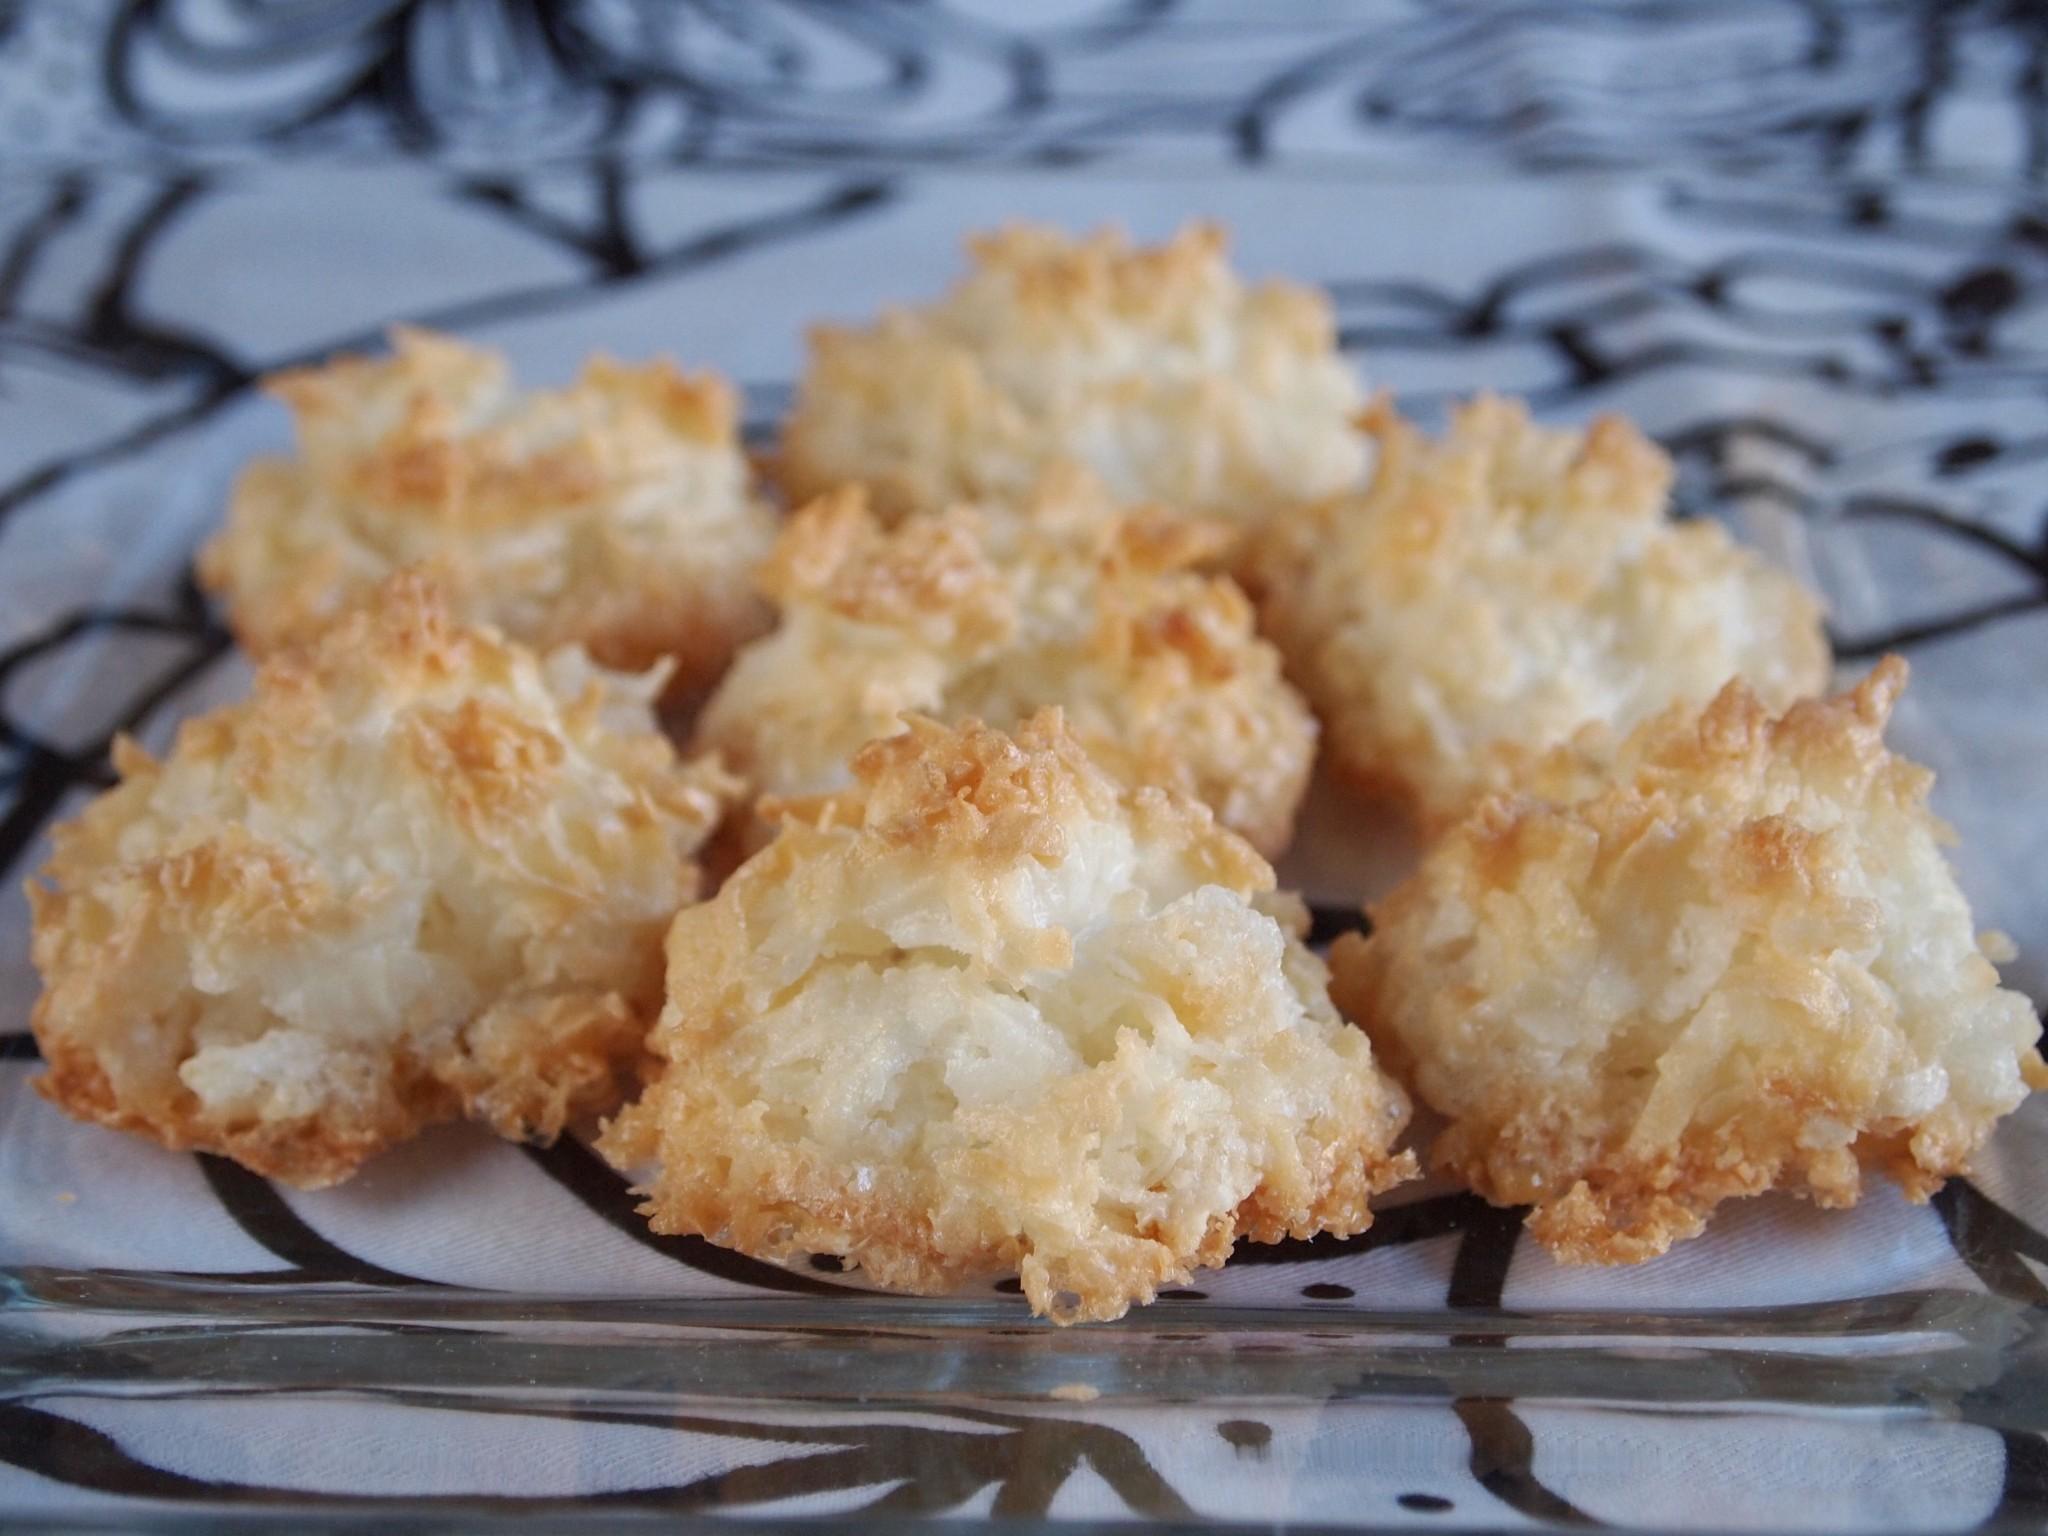 ... .ashleybrouwer.com/post/39847544691/cajetas-de-coco-coconut-truffles